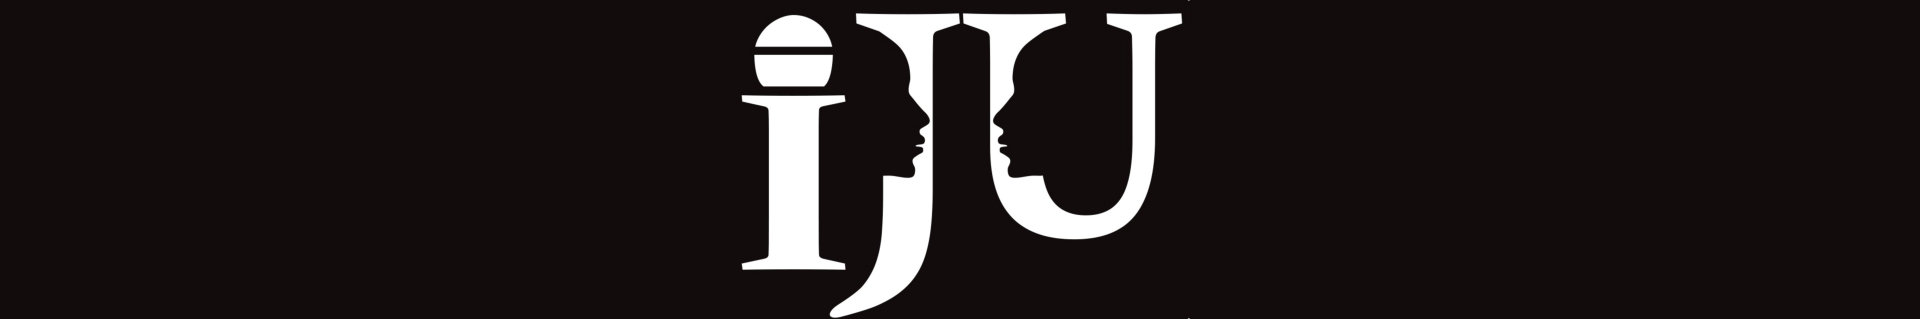 iJU Logo